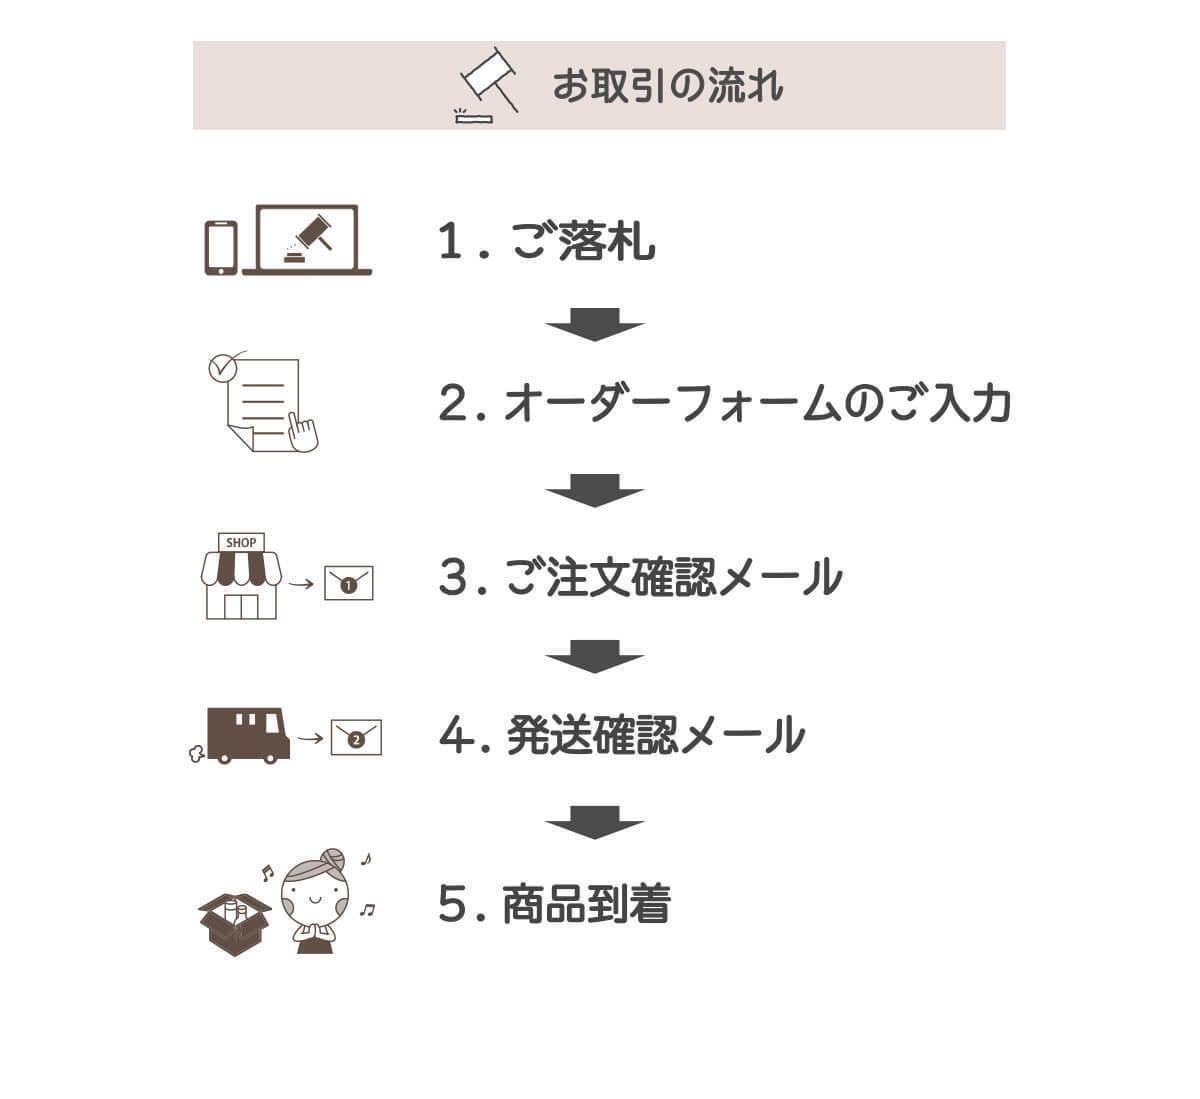 ▽ wonder 麹まるごと贅沢青汁 3g×30袋入 賞味期限 2022年2月27日迄 未開封品 ネコポス可_画像4